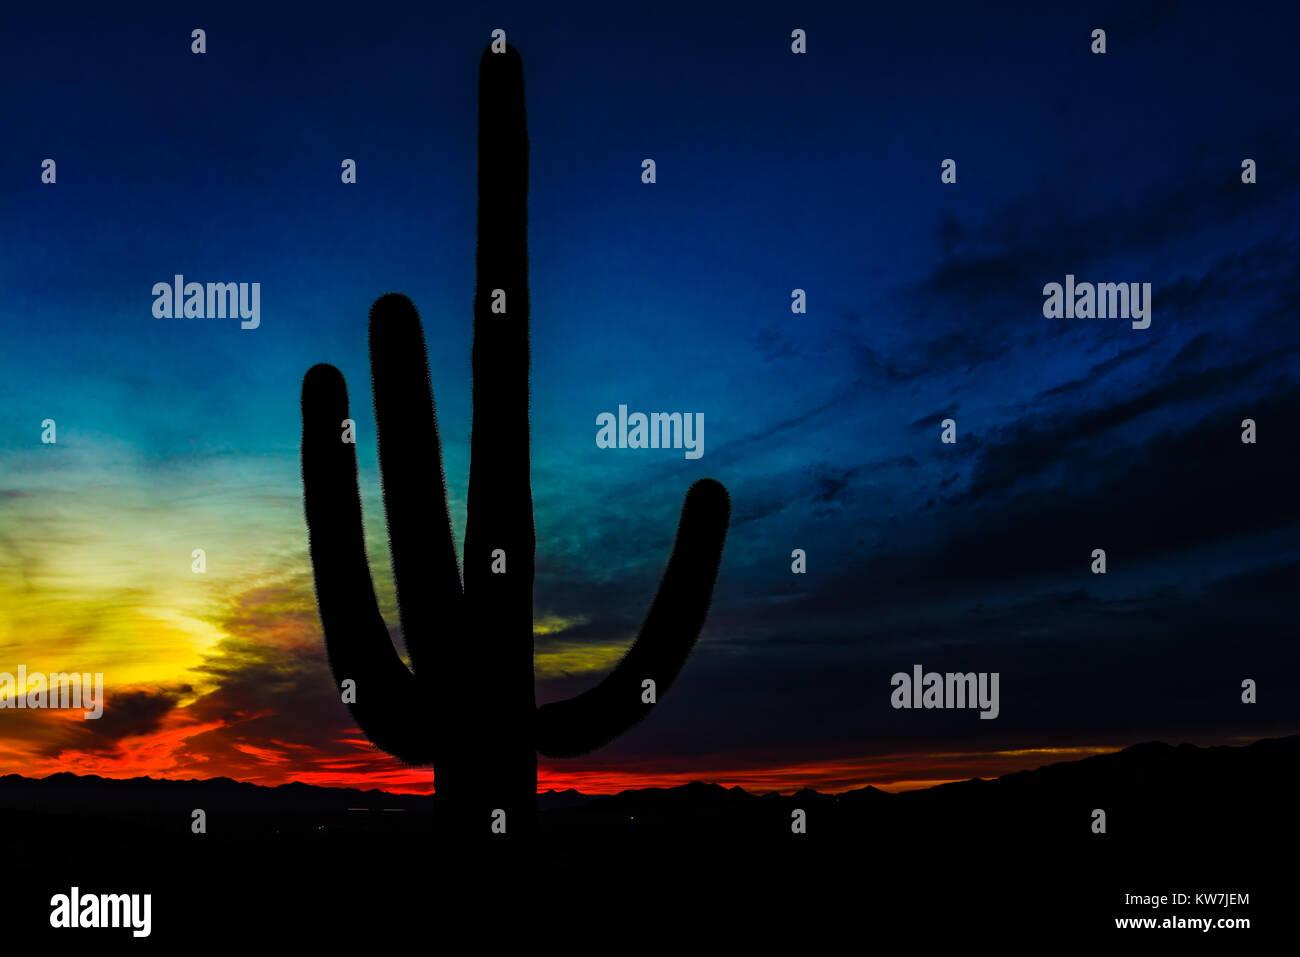 Saguaro cactus (Carnegiea gigantea) in the Saguaro National Park, Arizona, USA Stock Photo